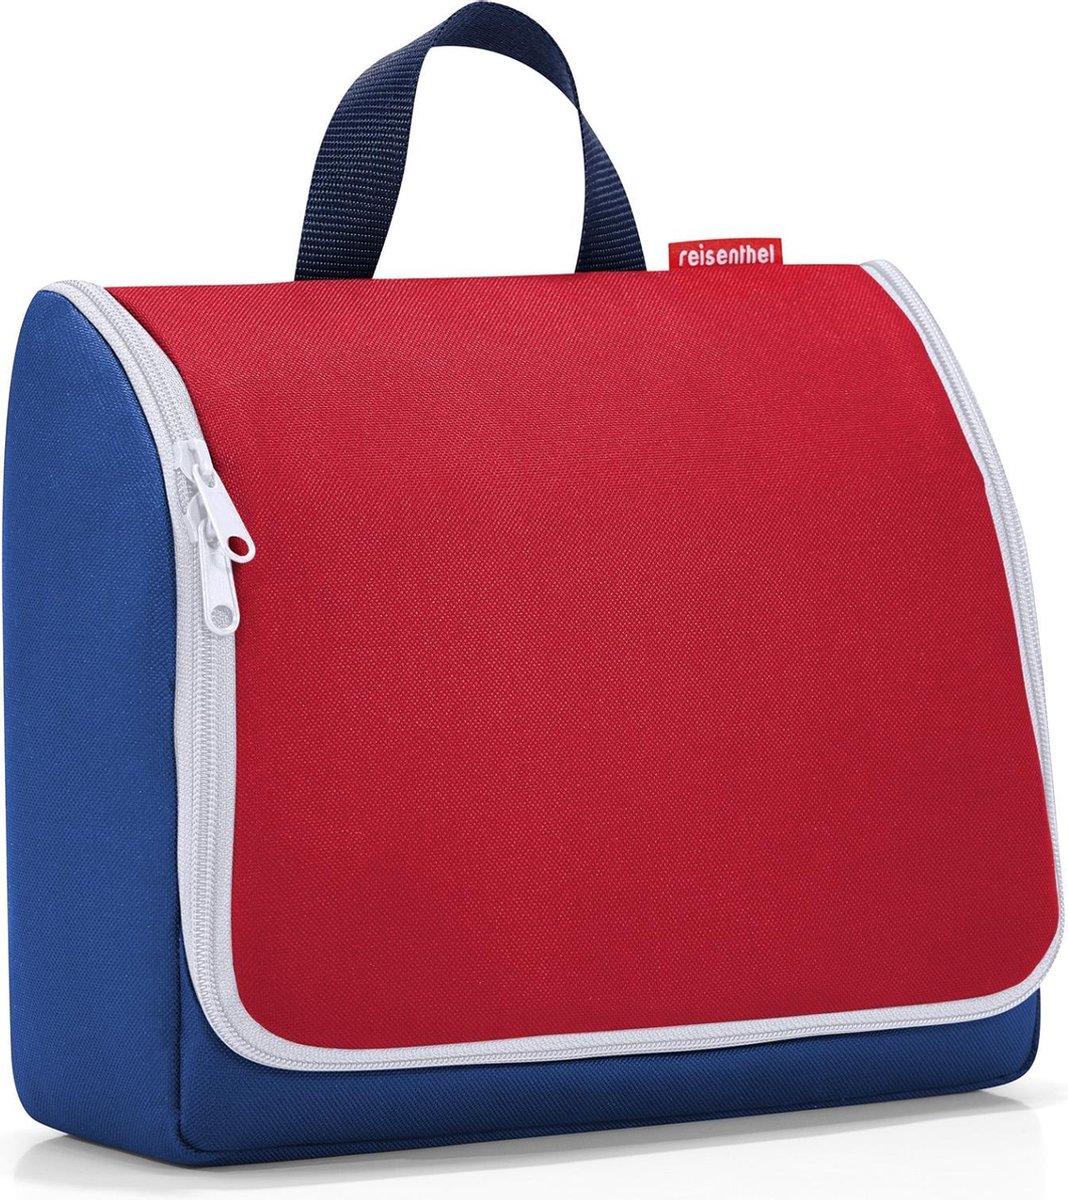 Reisenthel Toiletbag XL Toilettas Ophangen - Maat XL - 4L - Special Edition Nautic Blauw